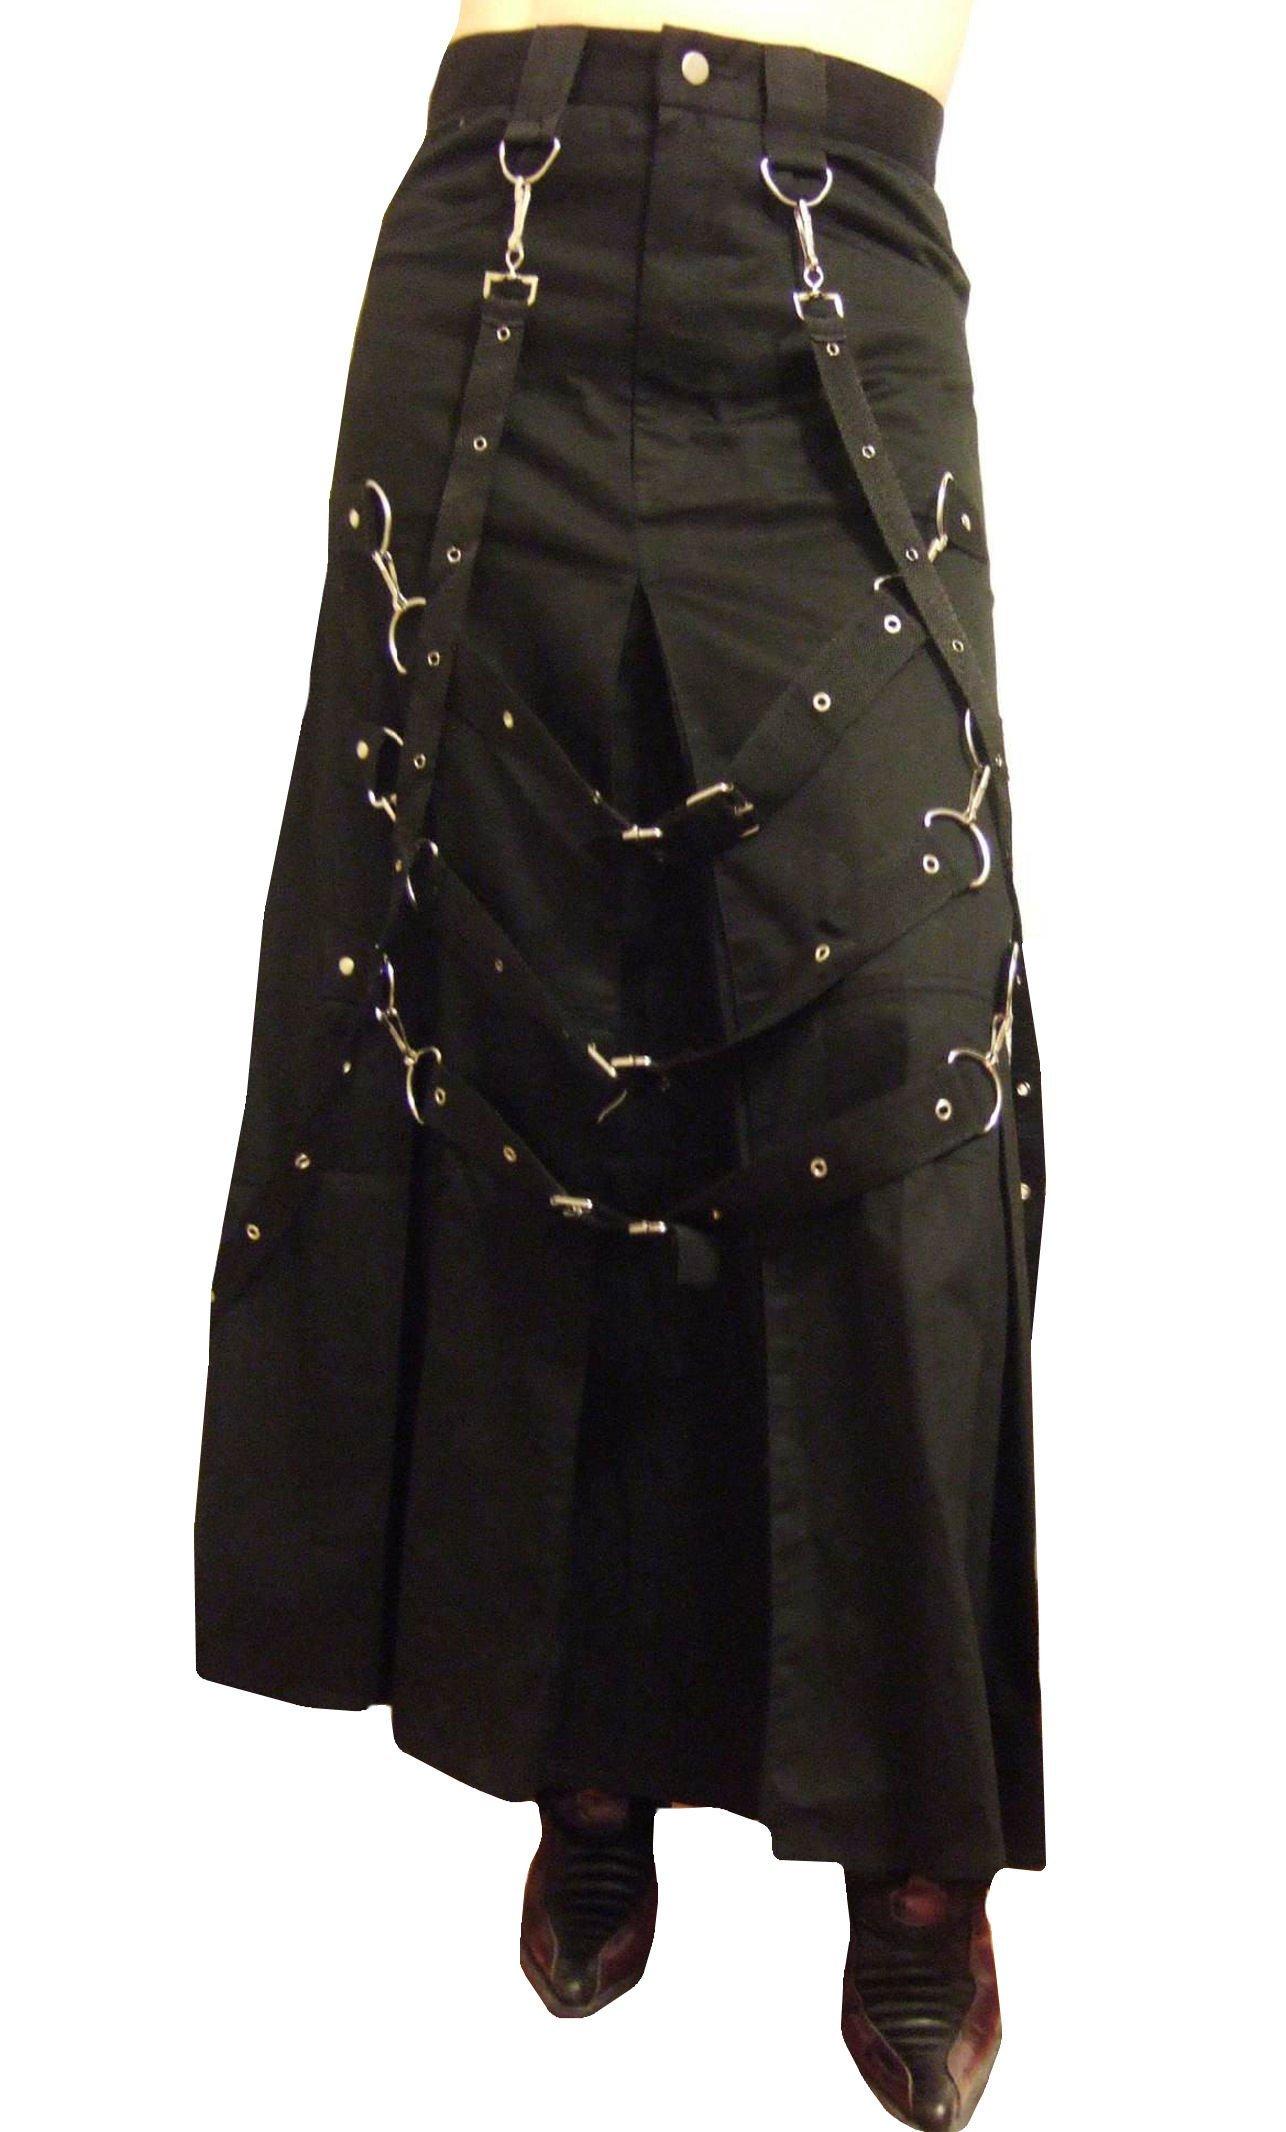 XXL Size 20 Unisex Heavy Cotton Drill Buckle & Chain Long Gothic Kilt Skirt